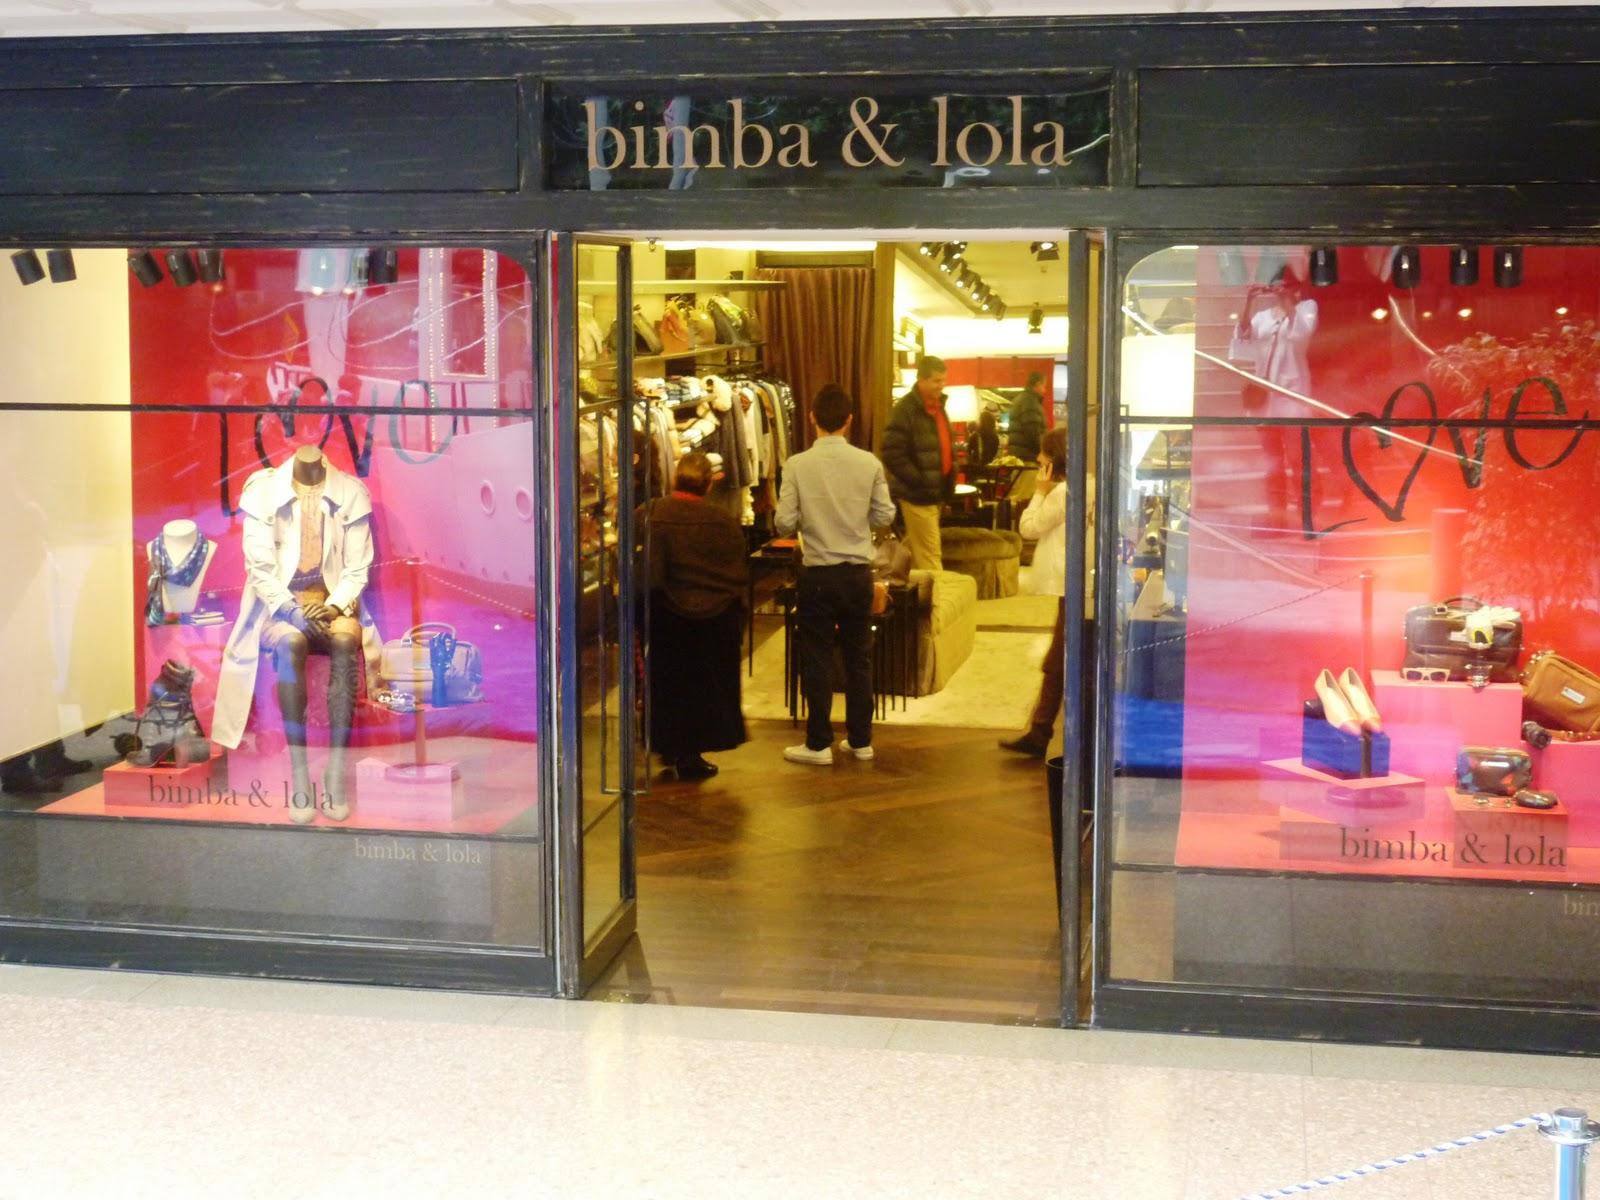 De la moda y otros demonios bimba lola entr a - Centro comercial moda shoping ...